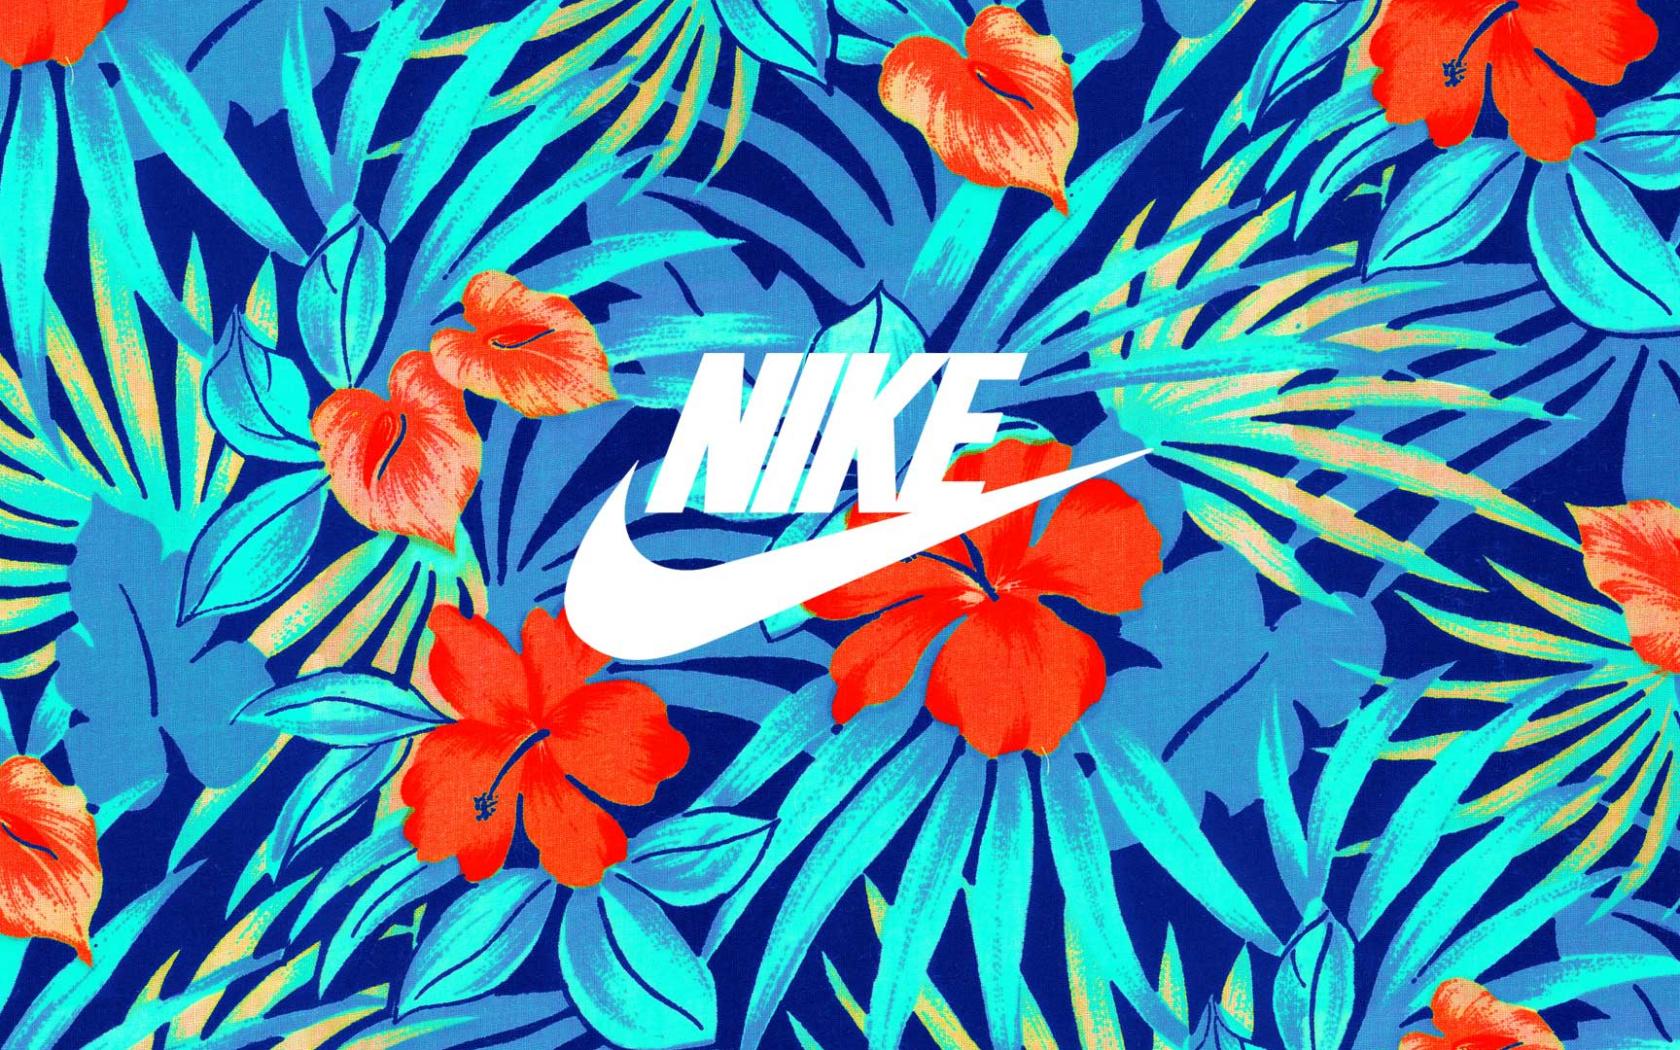 Free Download Tropical Wallpaper Pattern Hawaiian Patte 1728x1296